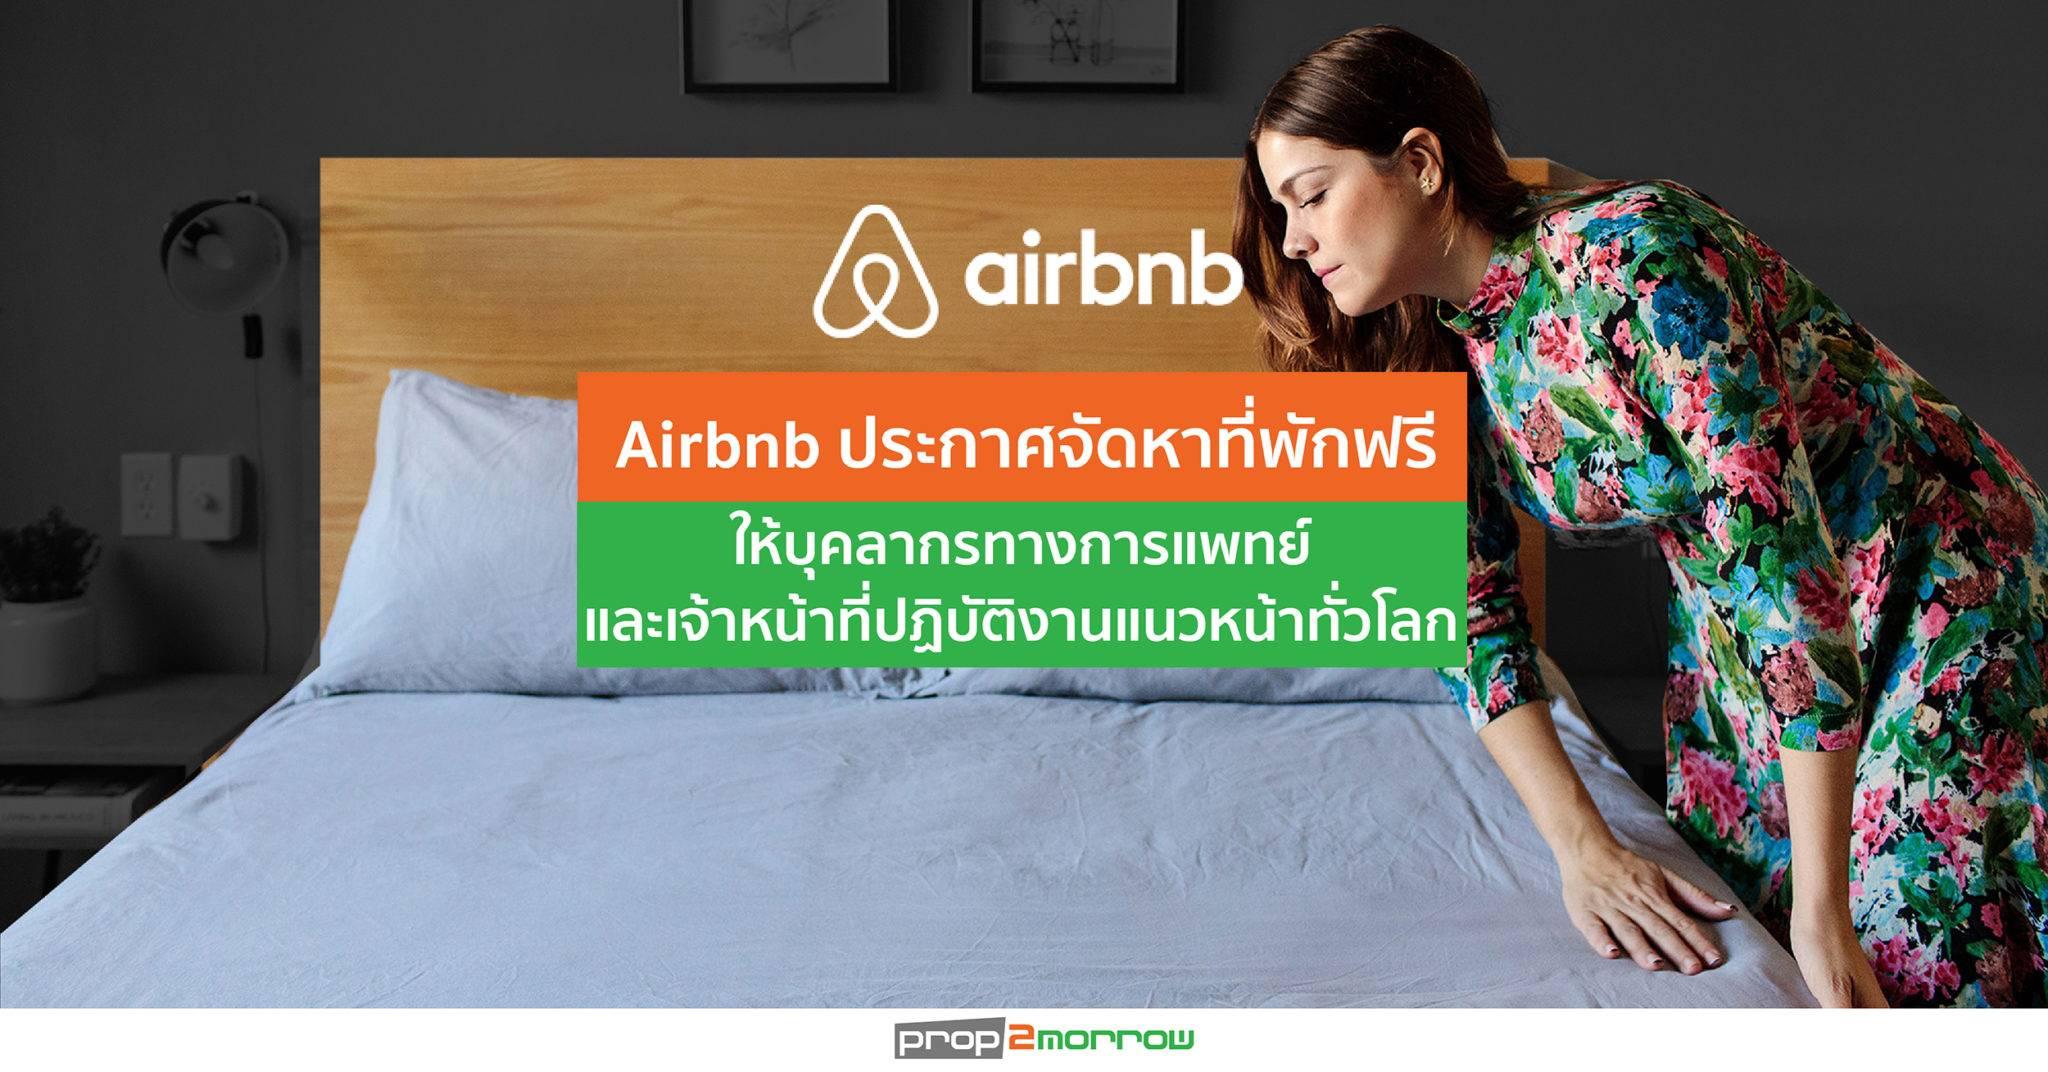 Airbnb ประกาศจัดหาที่พัก ฟรี ให้บุคลากรทางการแพทย์และเจ้าหน้าที่แนวหน้าทั่วโลก | Prop2Morrow บ้าน คอนโด ข่าวอสังหาฯ